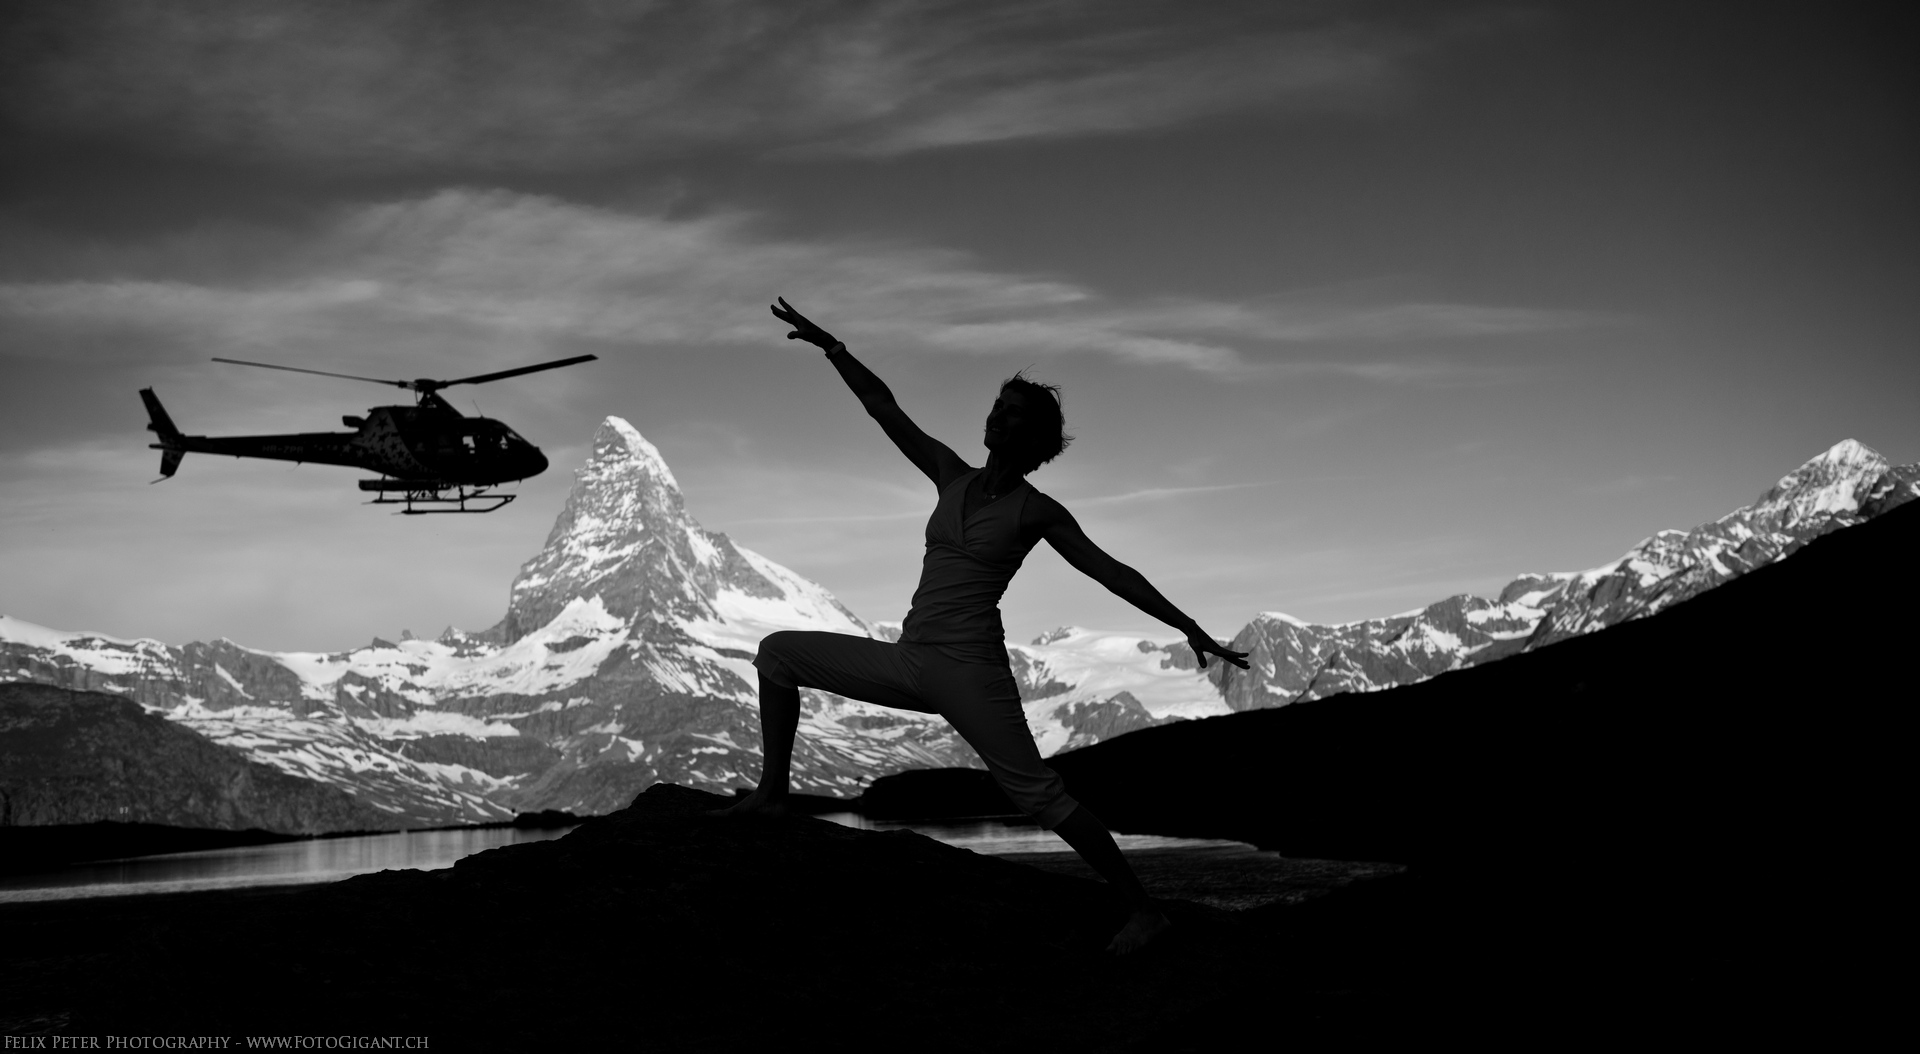 Felix-Peter-Yoga-Pilates-Dance-Fotografie_Bern_157.jpg